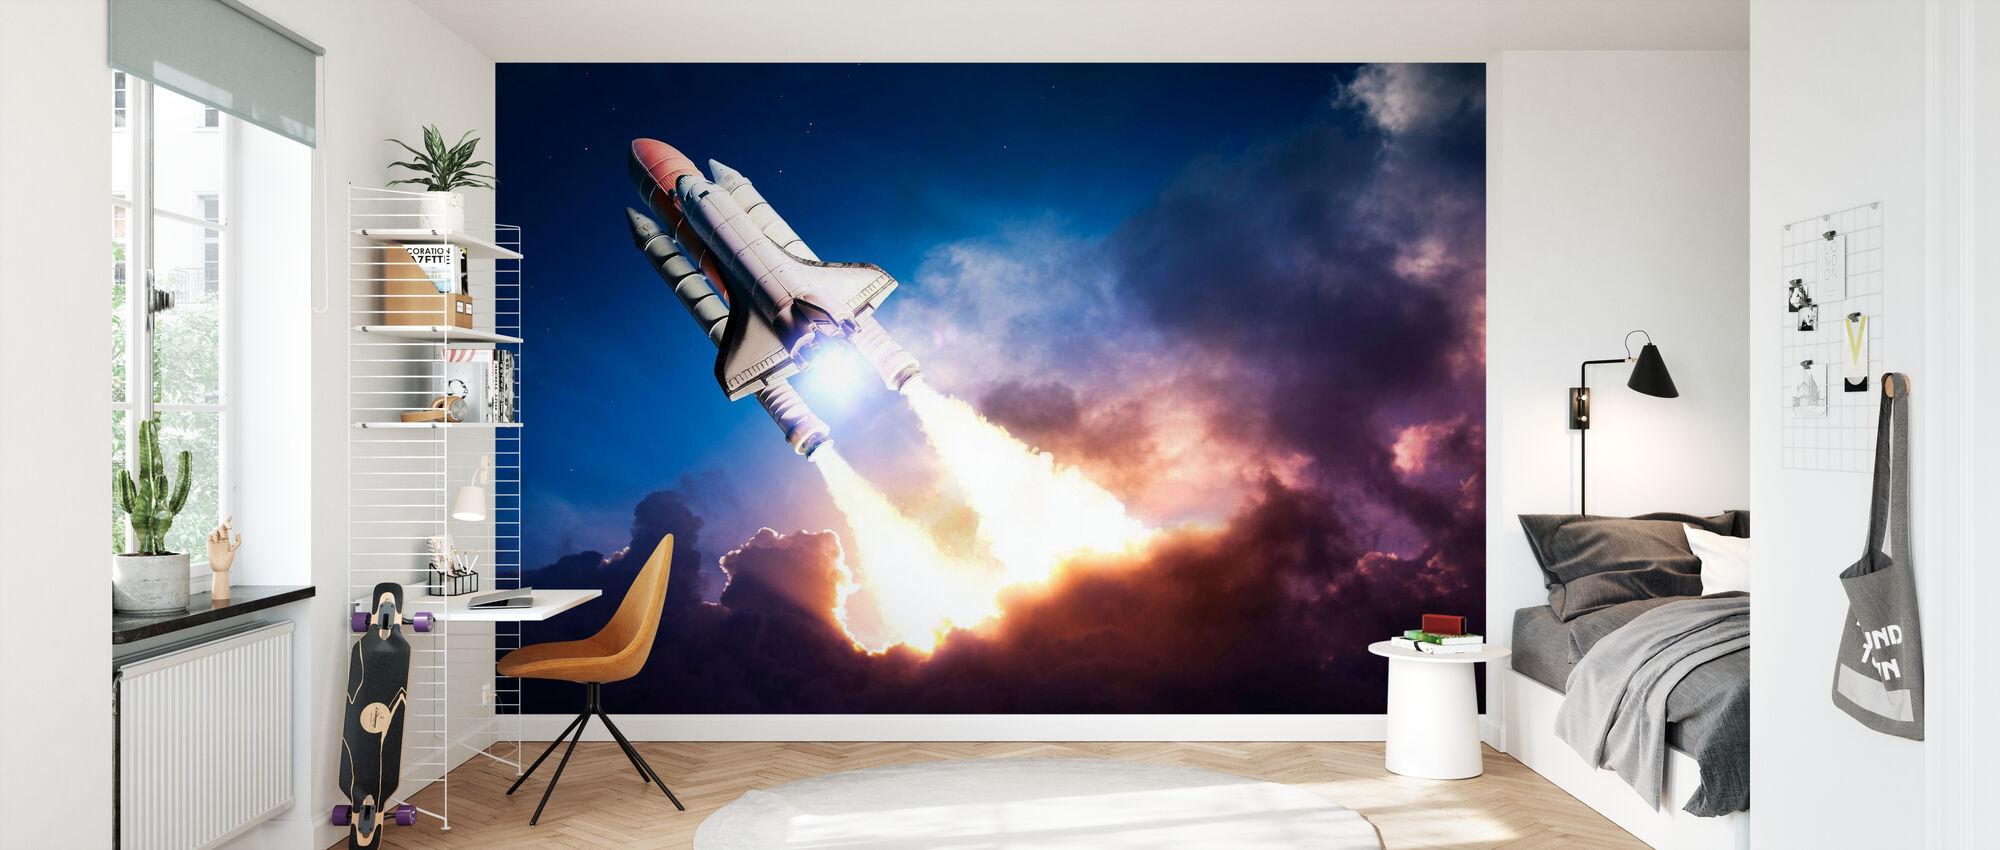 Space Adventure - Wallpaper - Kids Room